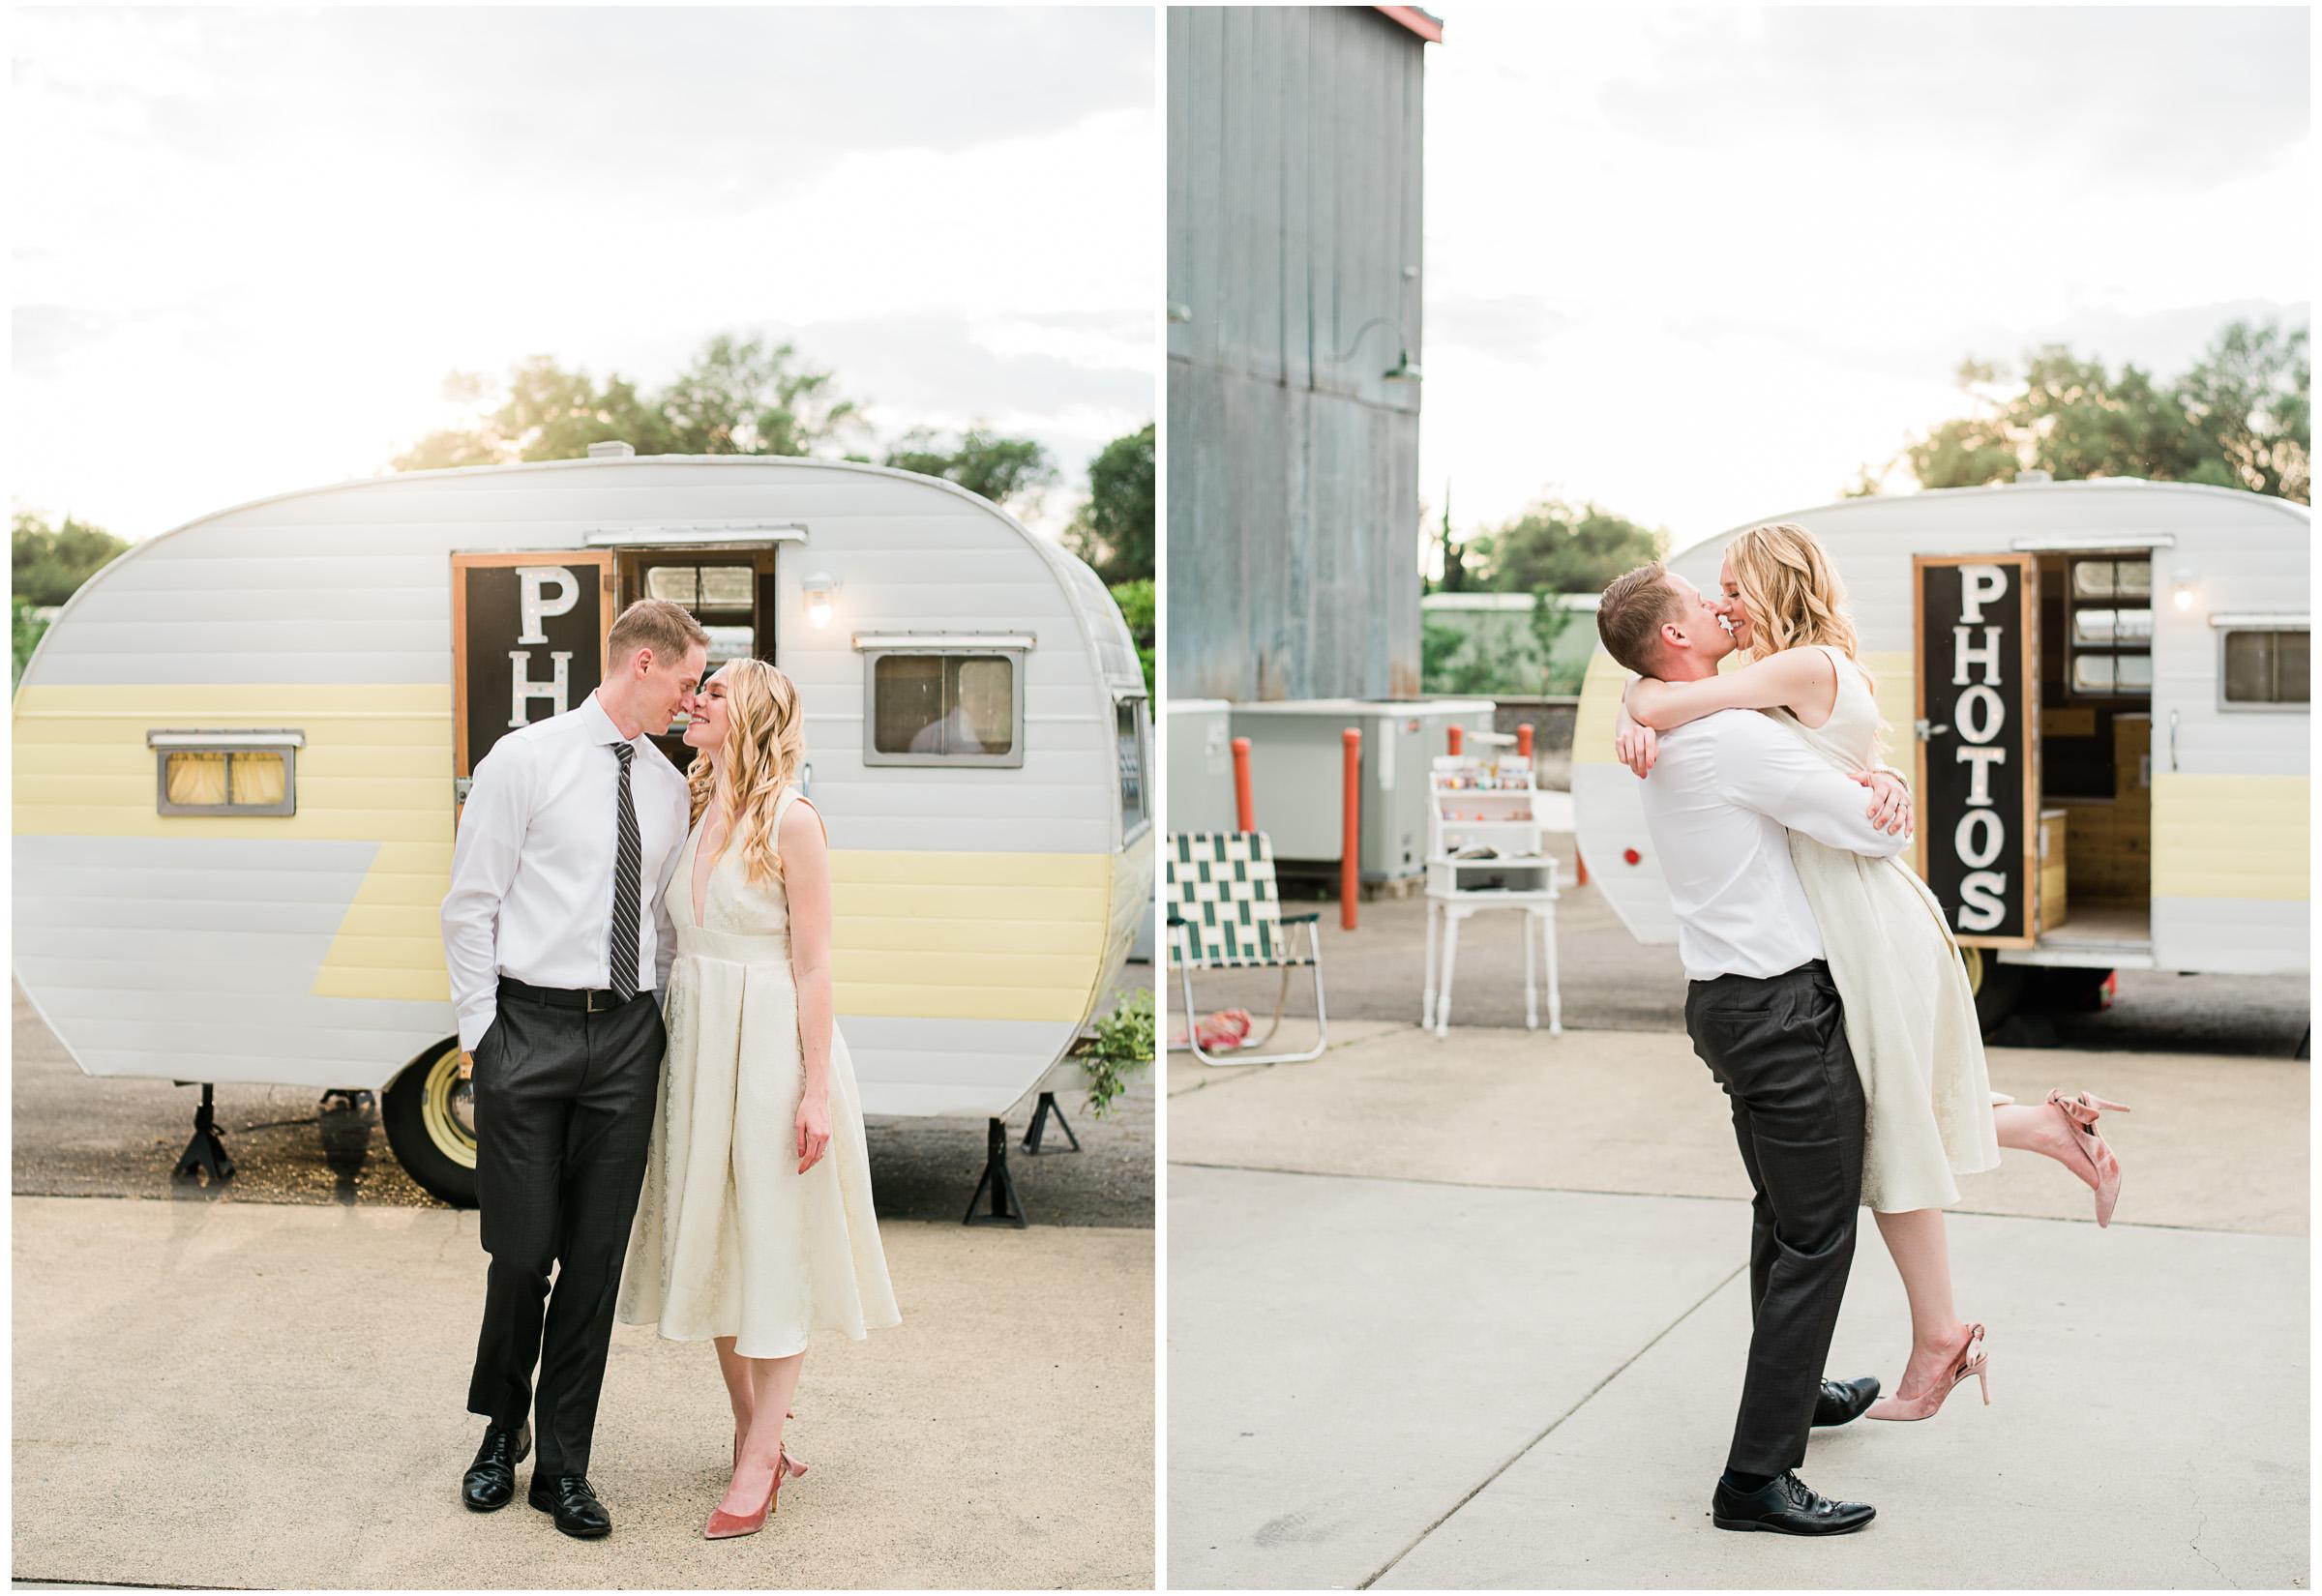 Loomis Wedding - Sacramento Photographer - Blue Goose - Justin Wilcox Photography - 16.jpg